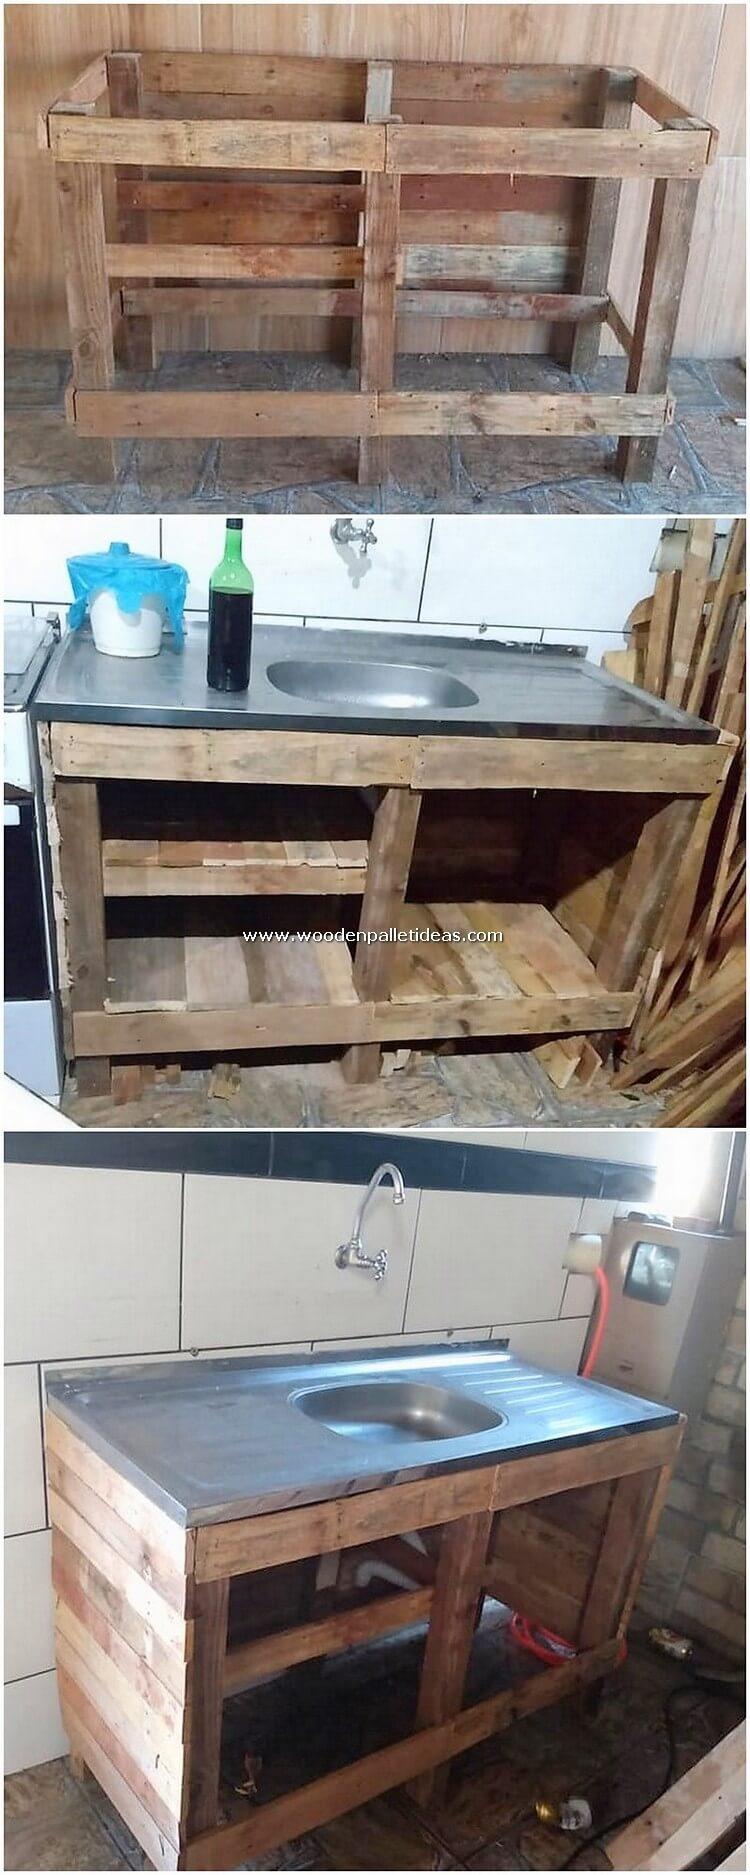 DIY-Pallet-Sink